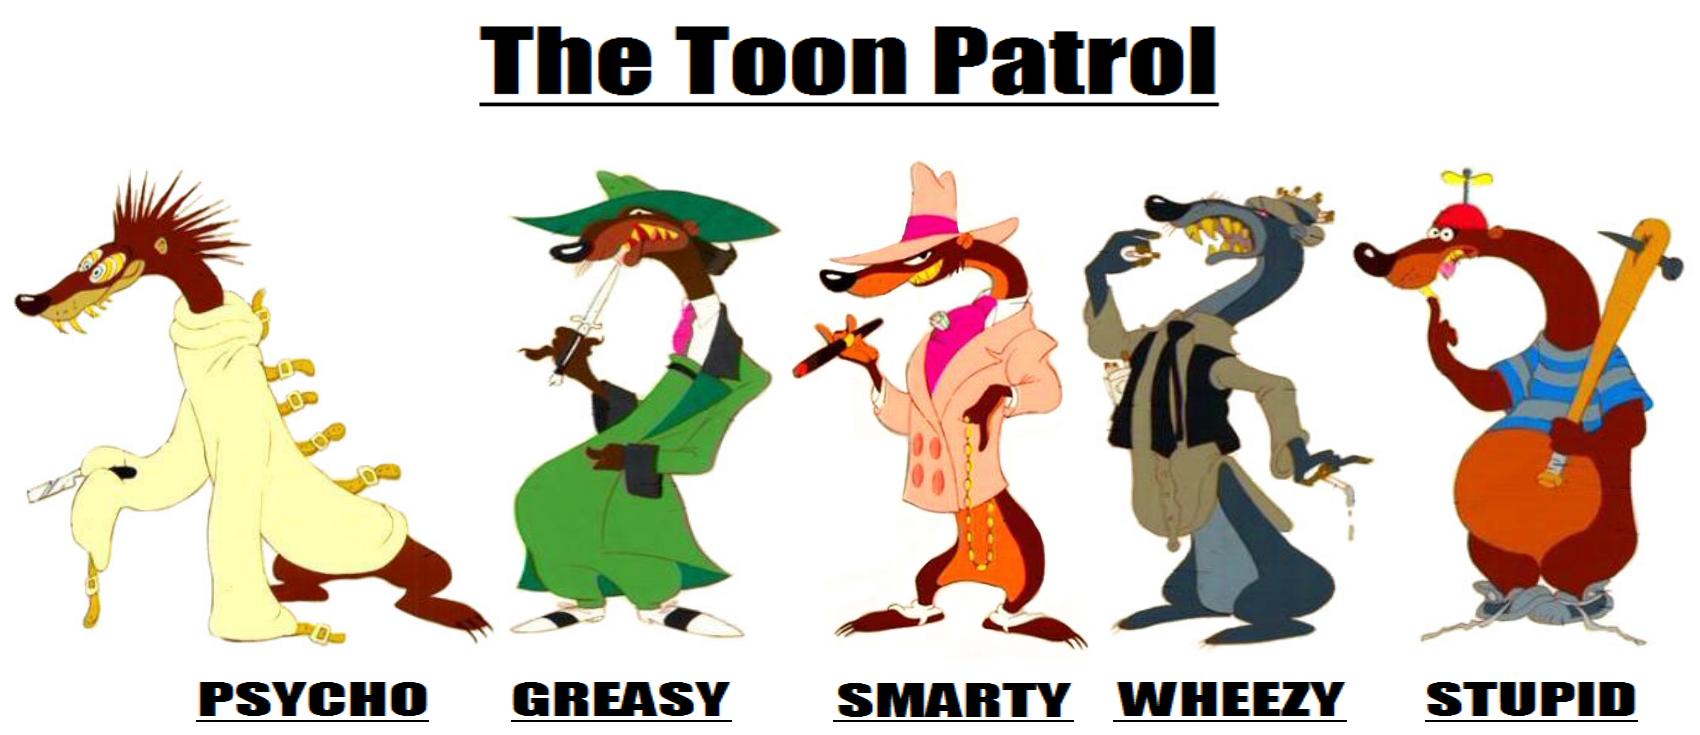 The_Toon_Patrol.png